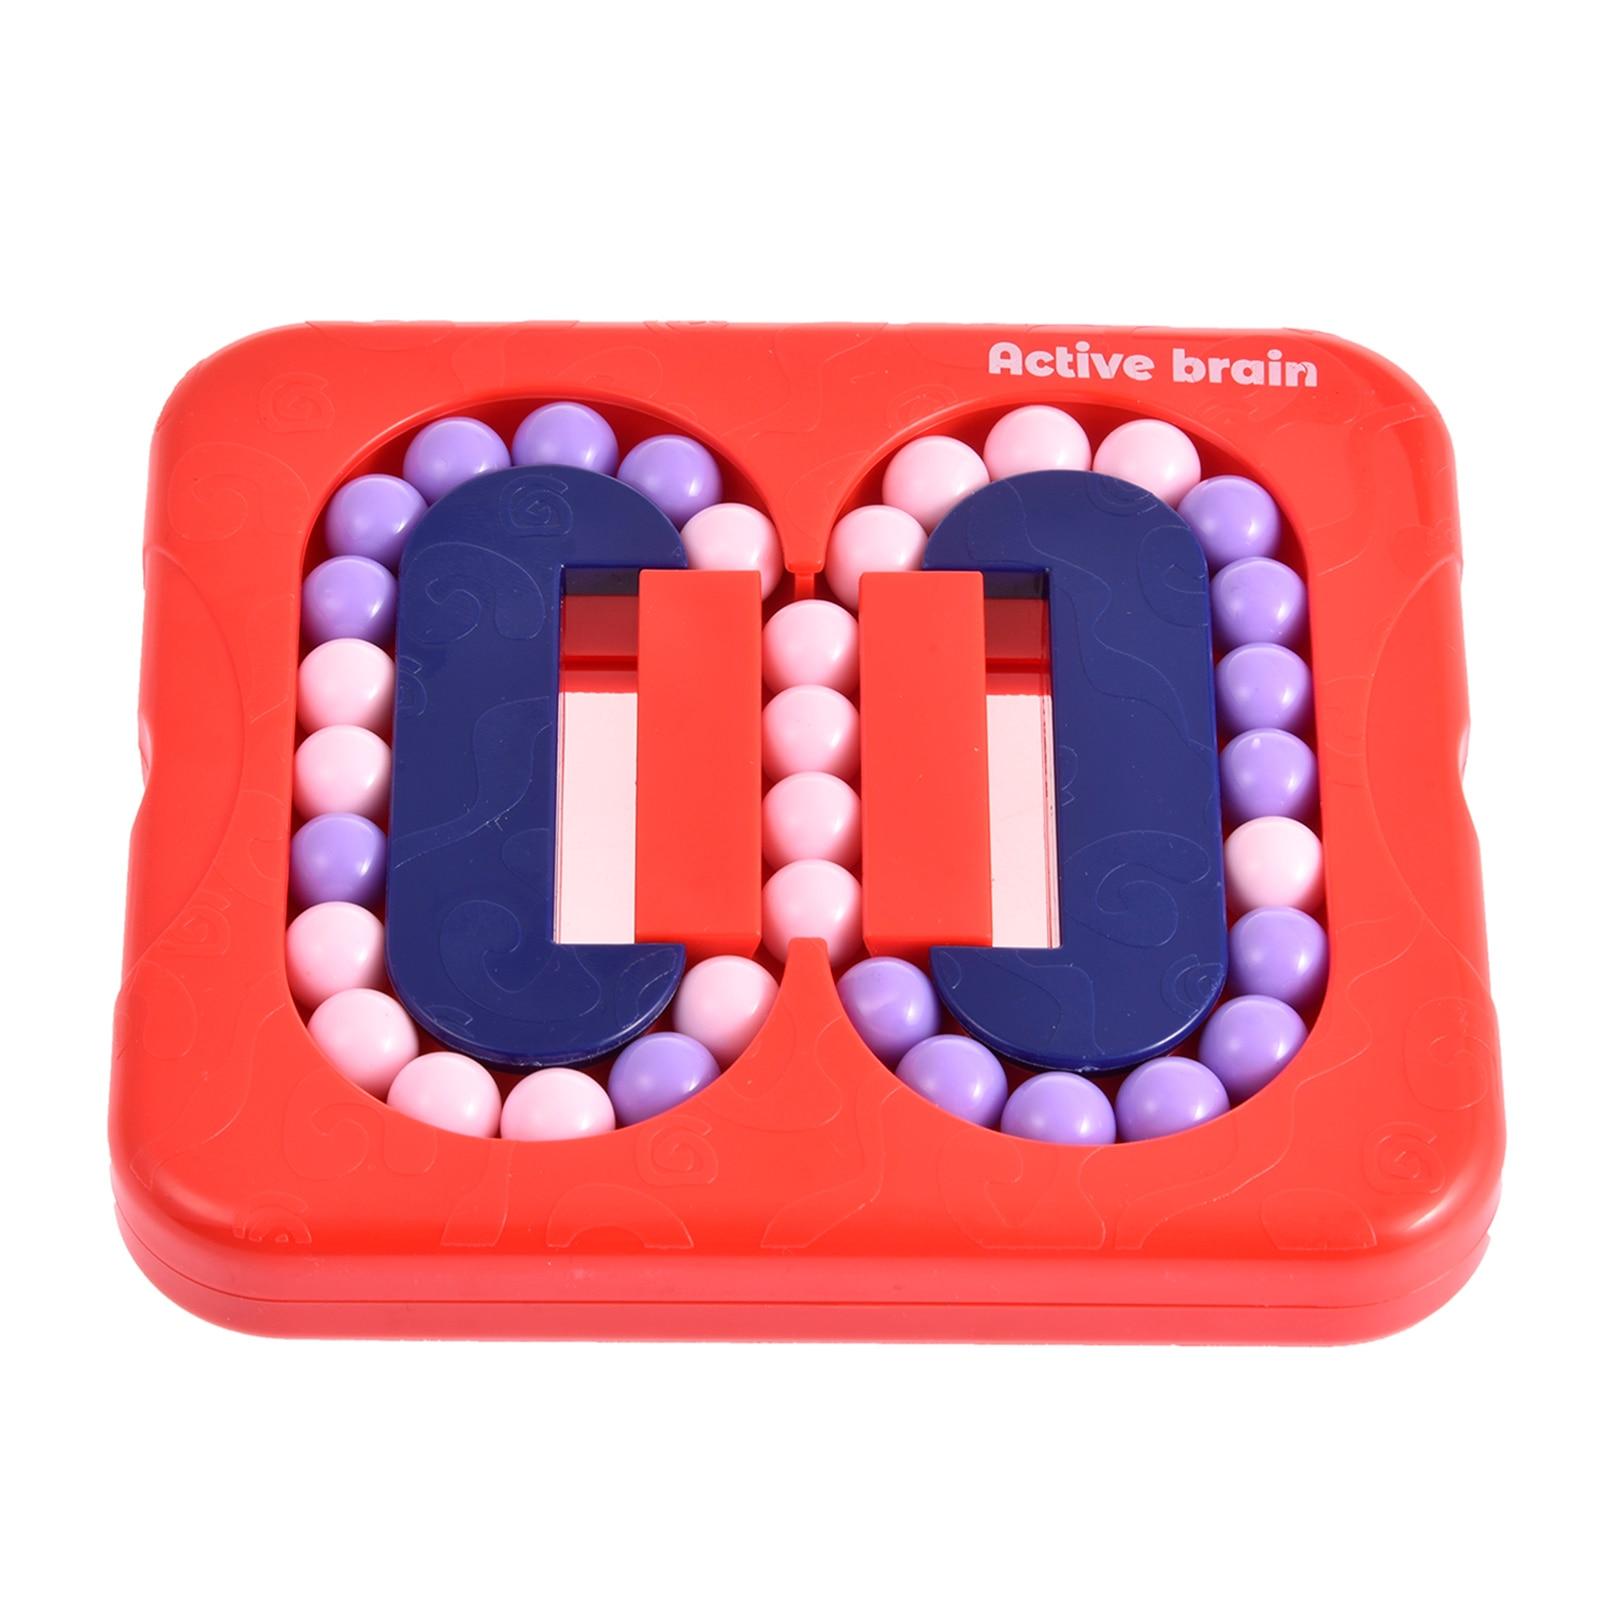 Fidget Toys Flat Rolling Beads Game Maze Mechanism Box Magic Bean Prevent Alzheimer's Brain Burning Anti-Stress Toy For kids enlarge